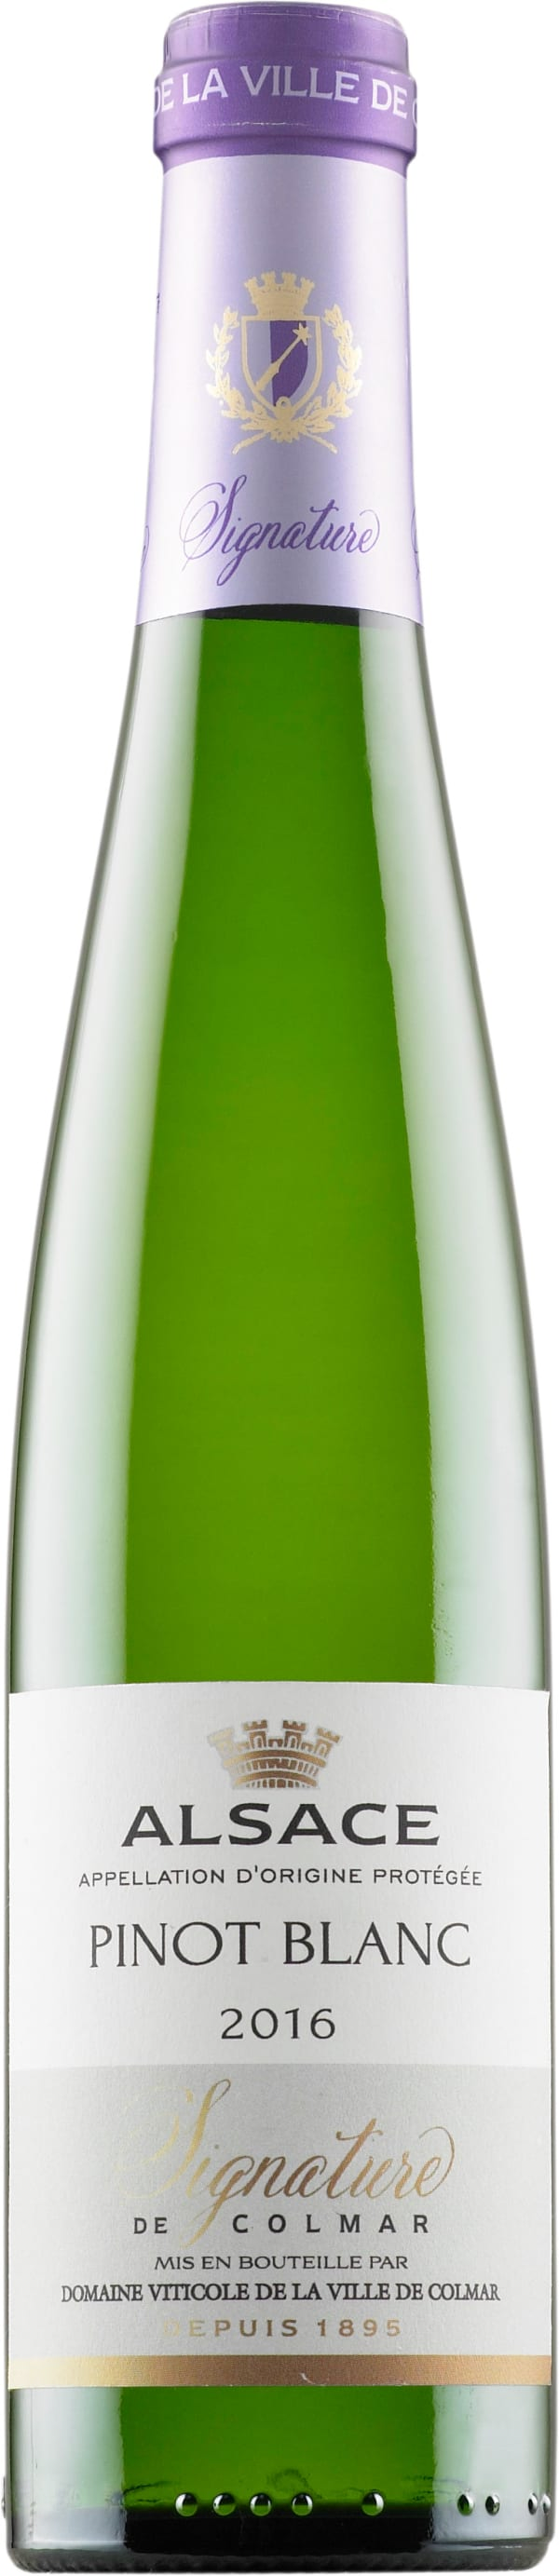 Signature de Colmar Pinot Blanc 2018